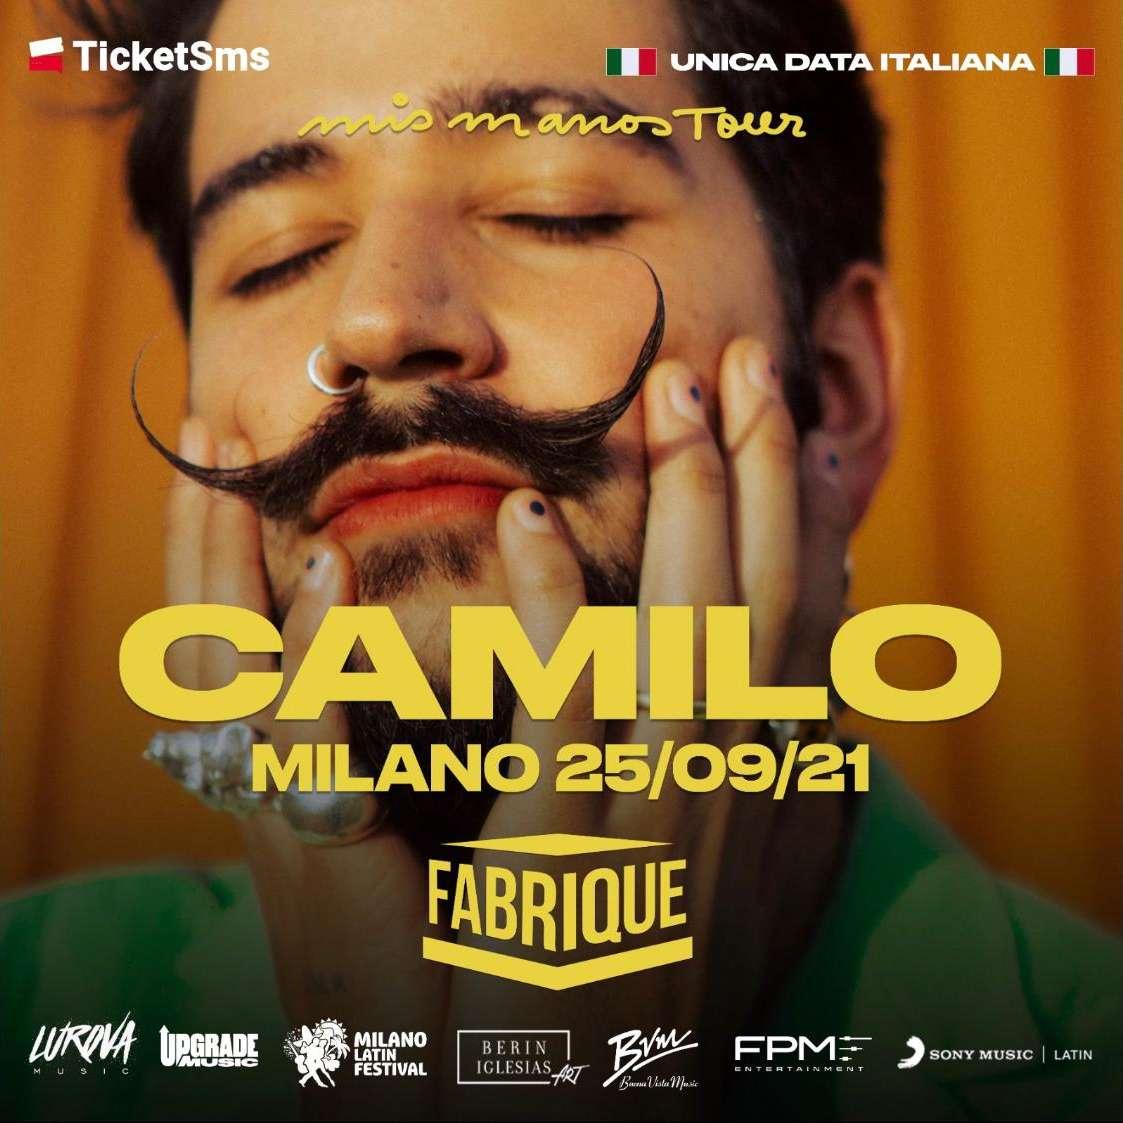 Camilo - Mis Manos Tour - Fabrique Milano Fabrique Milano / MI